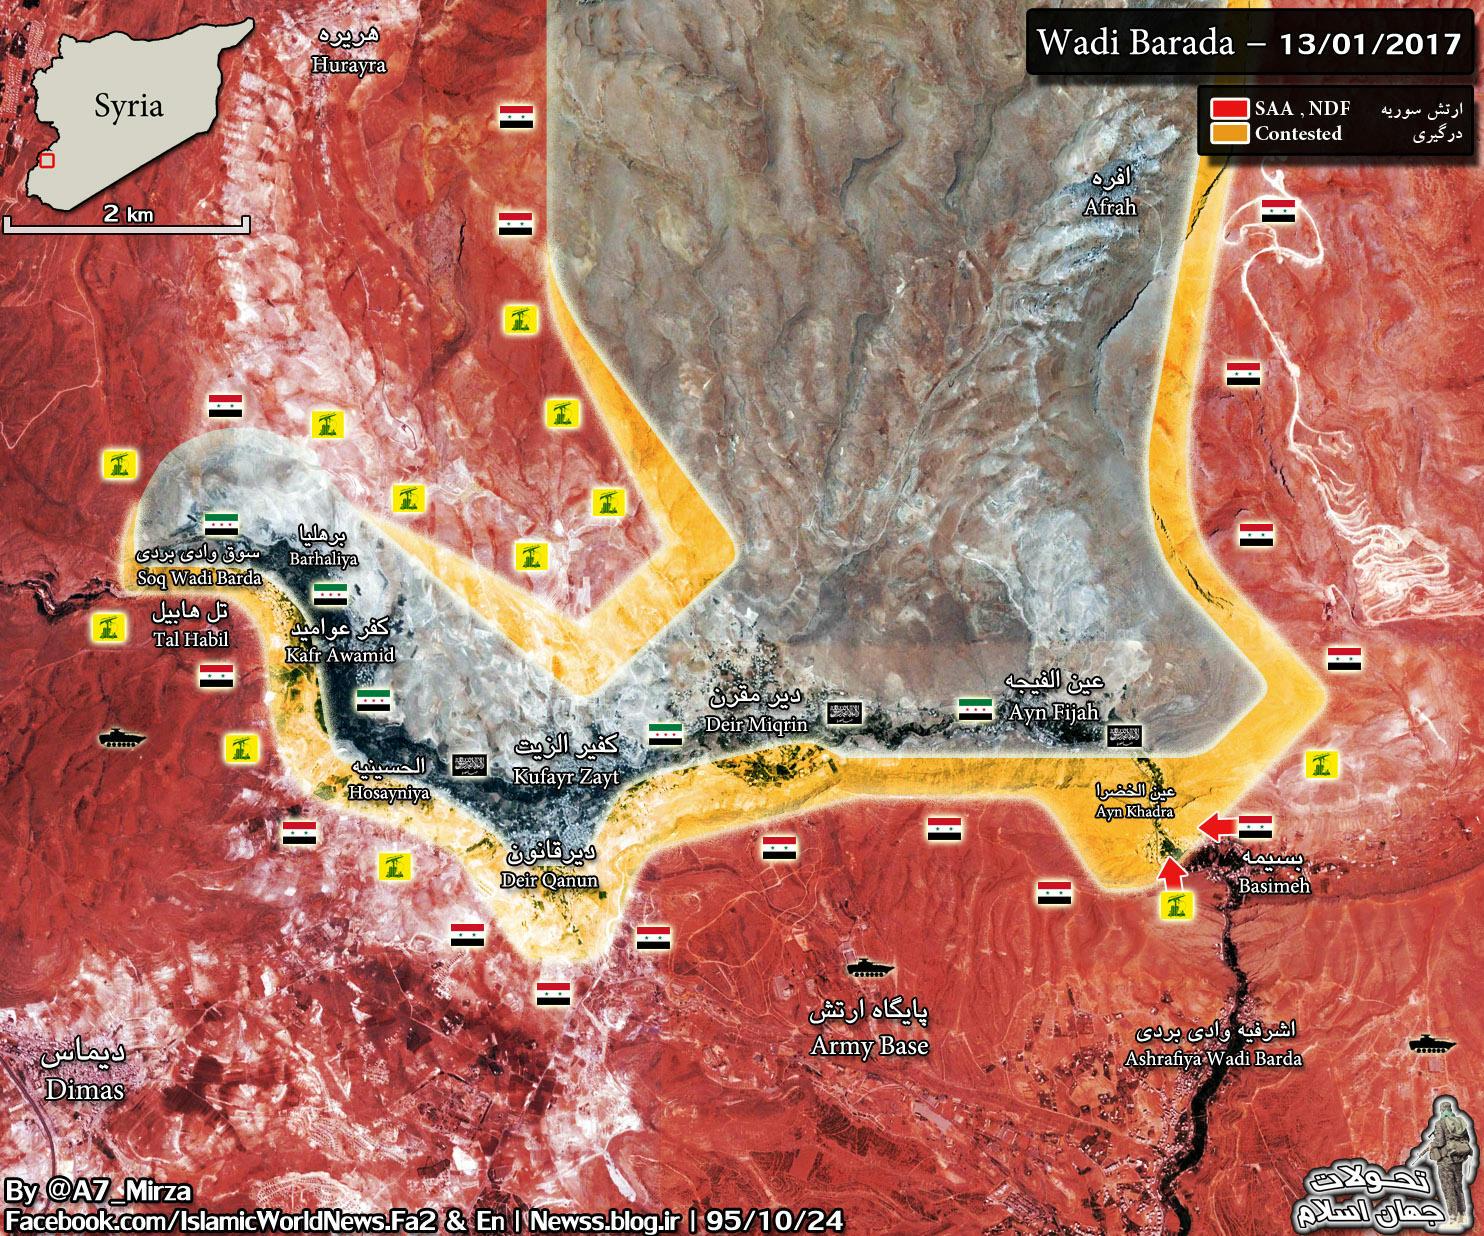 [BIZTPOL] Szíria és Irak - 3. - Page 3 8gd36a5lu1icu19zg